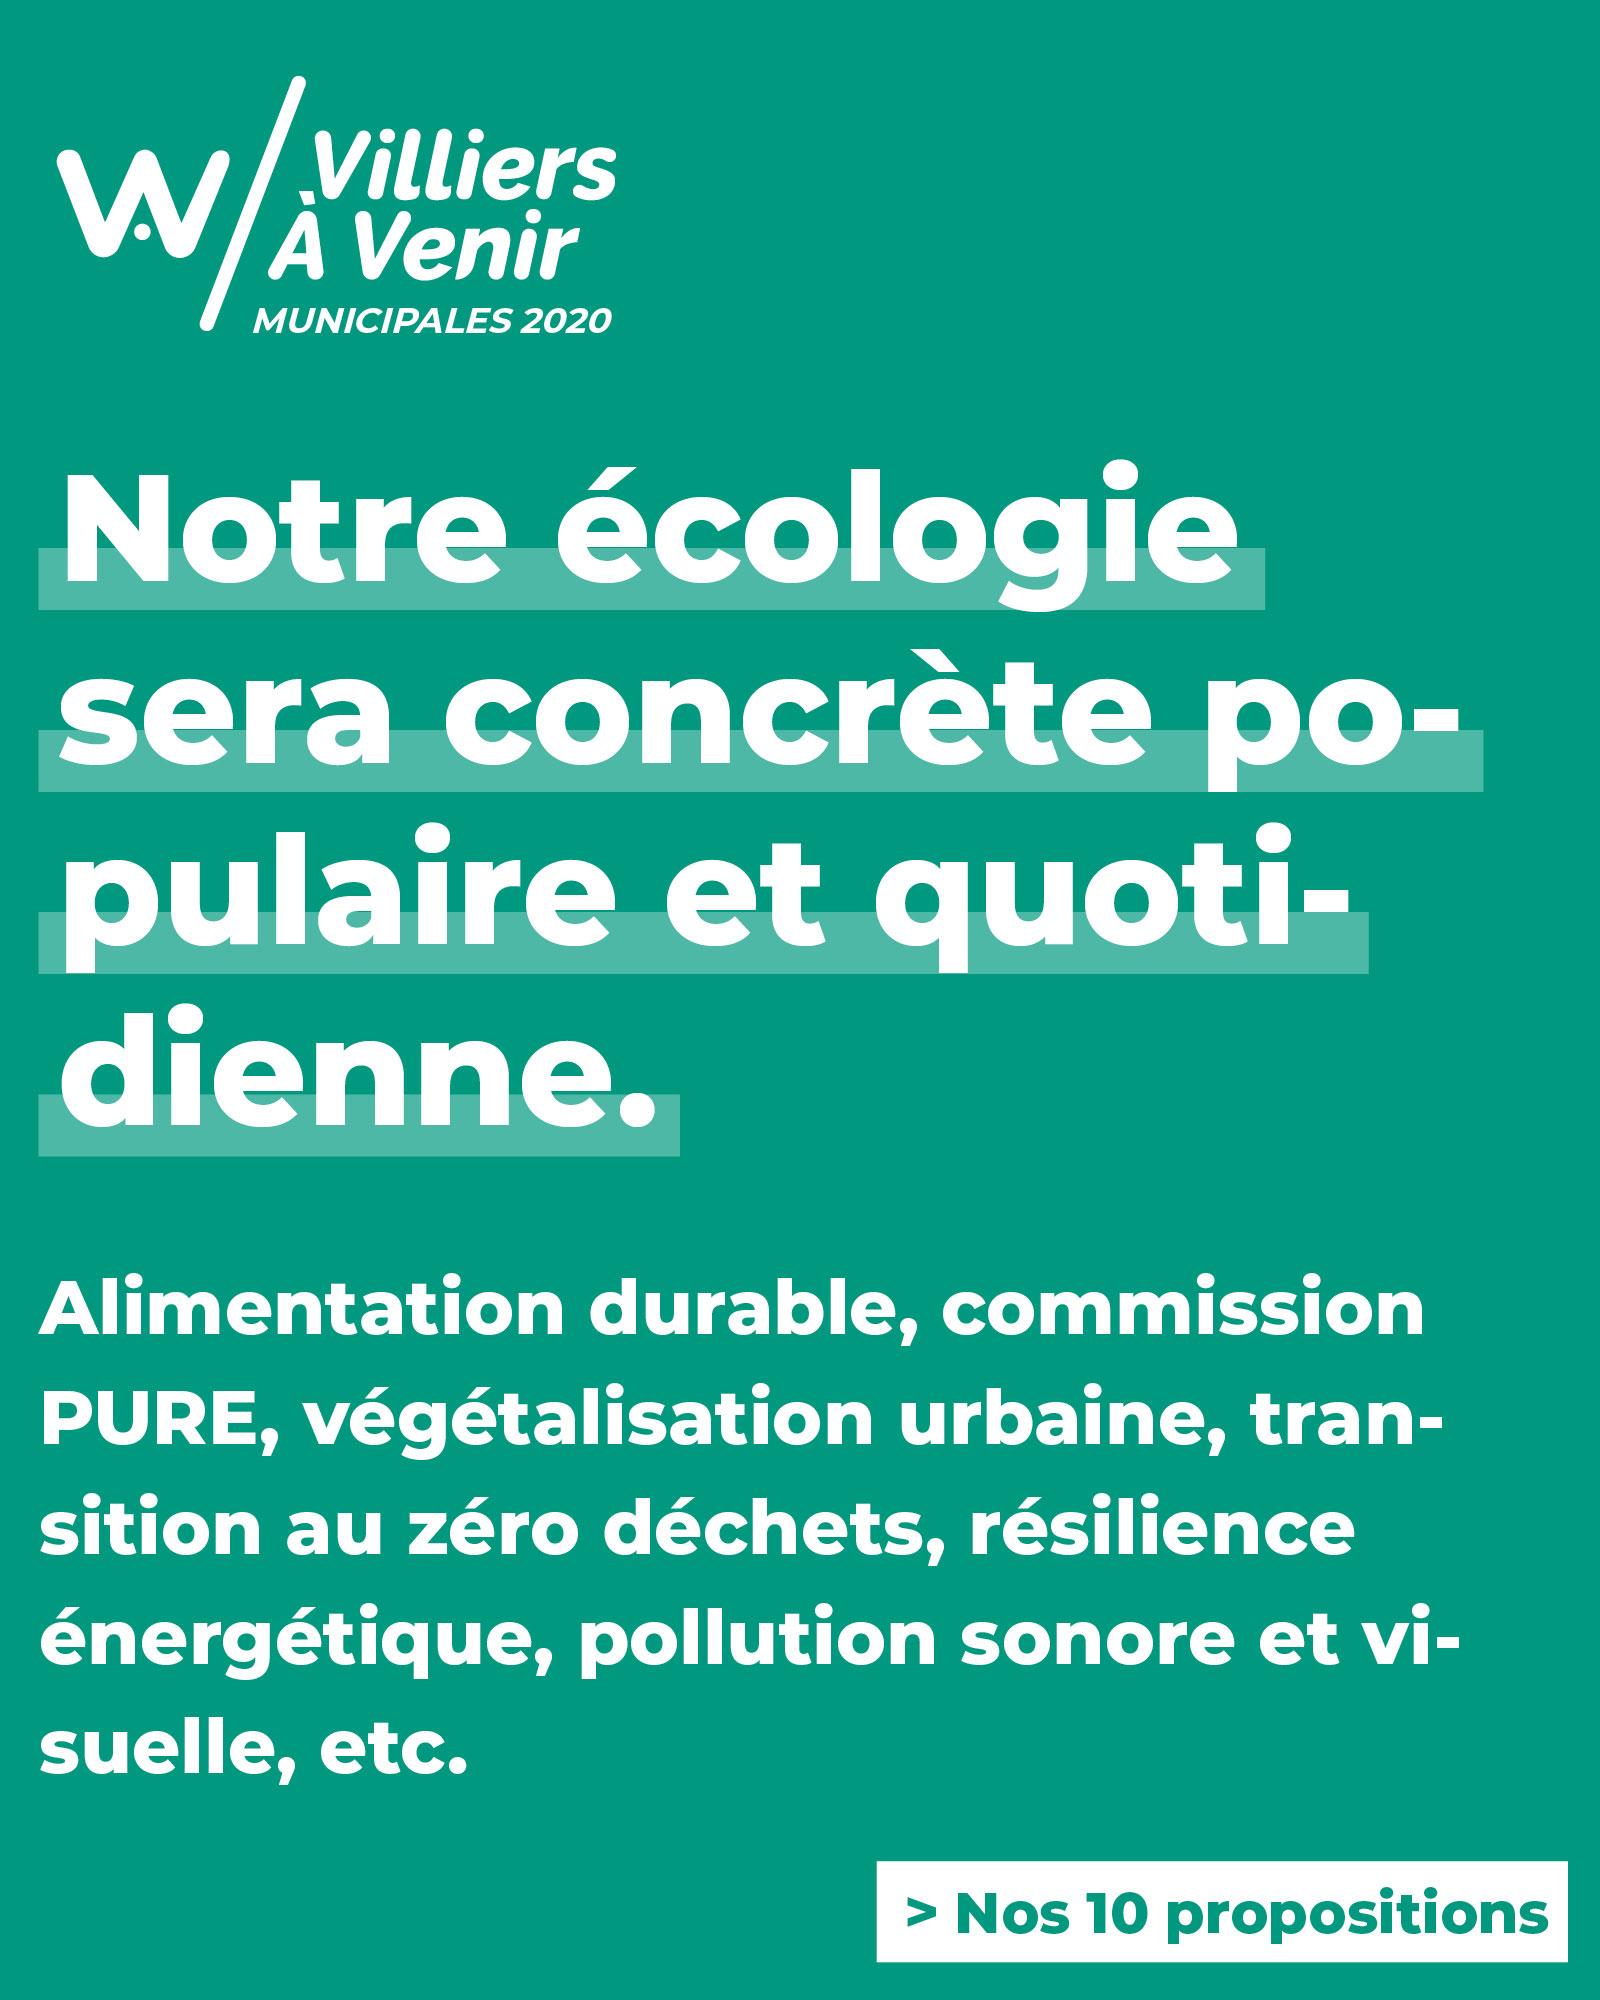 http://vav94.fr/wp-content/uploads/2020/03/ECOLOGIE-VILLIERS-A-VENIR-PROGRAMME-MUNICIPALES-2020-VILLIERS-SUR-MARNE-1.jpg